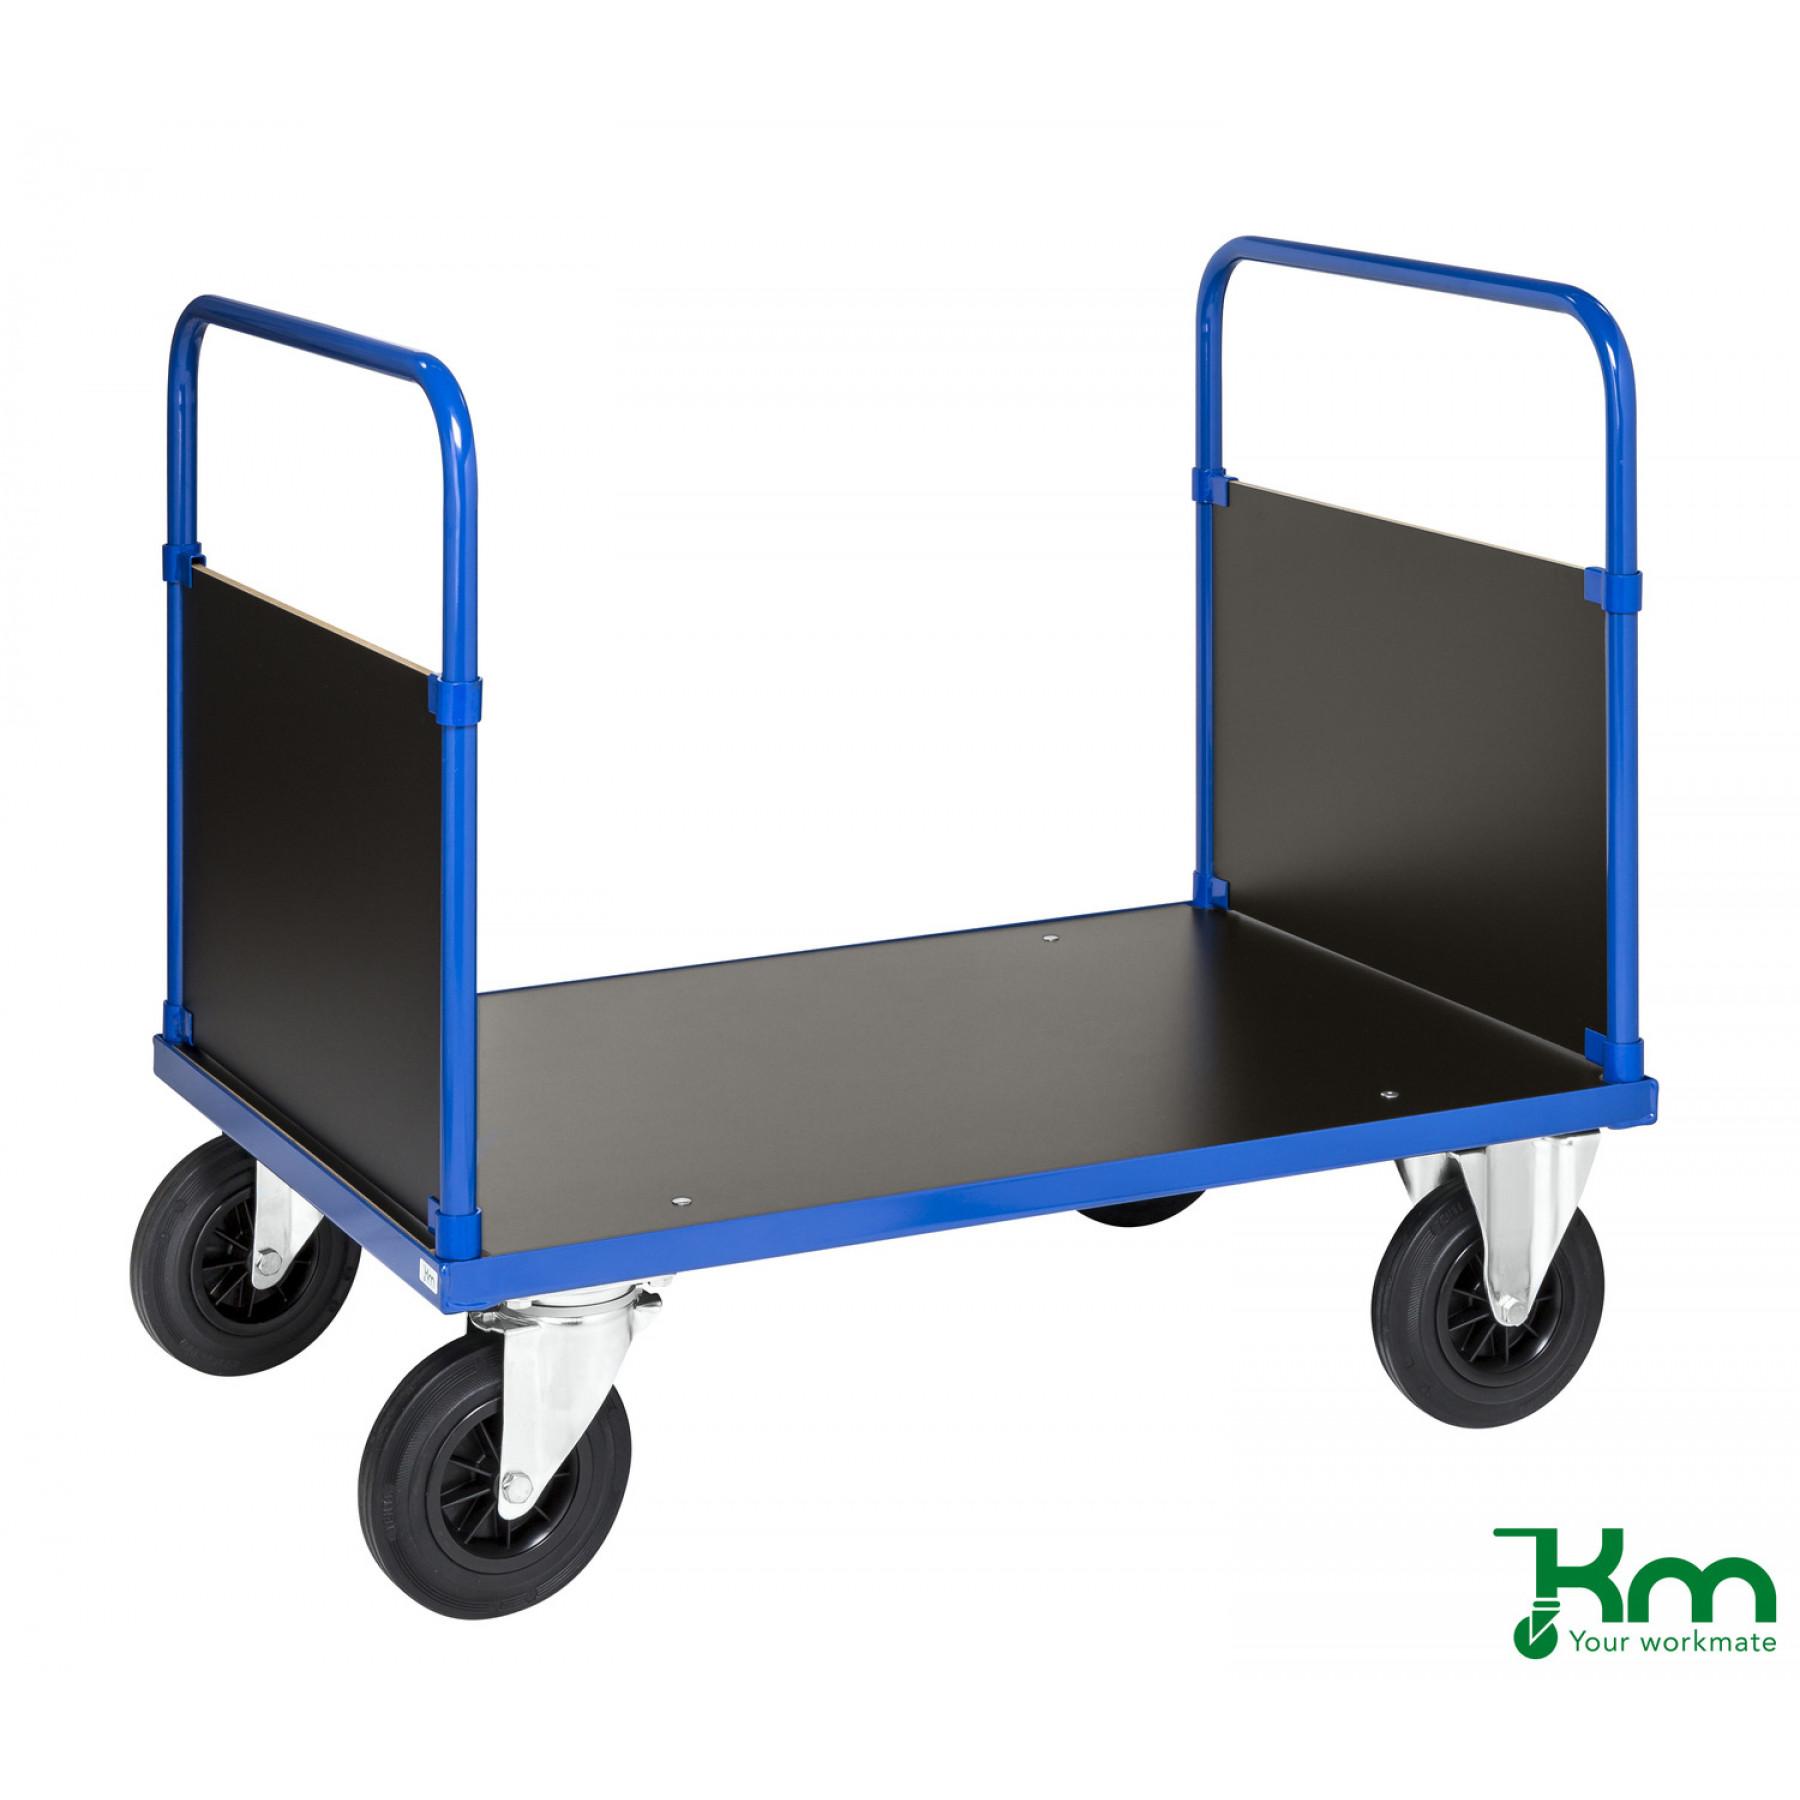 Dubbele kopwandwagen met MDF laadvloer en kopwanden